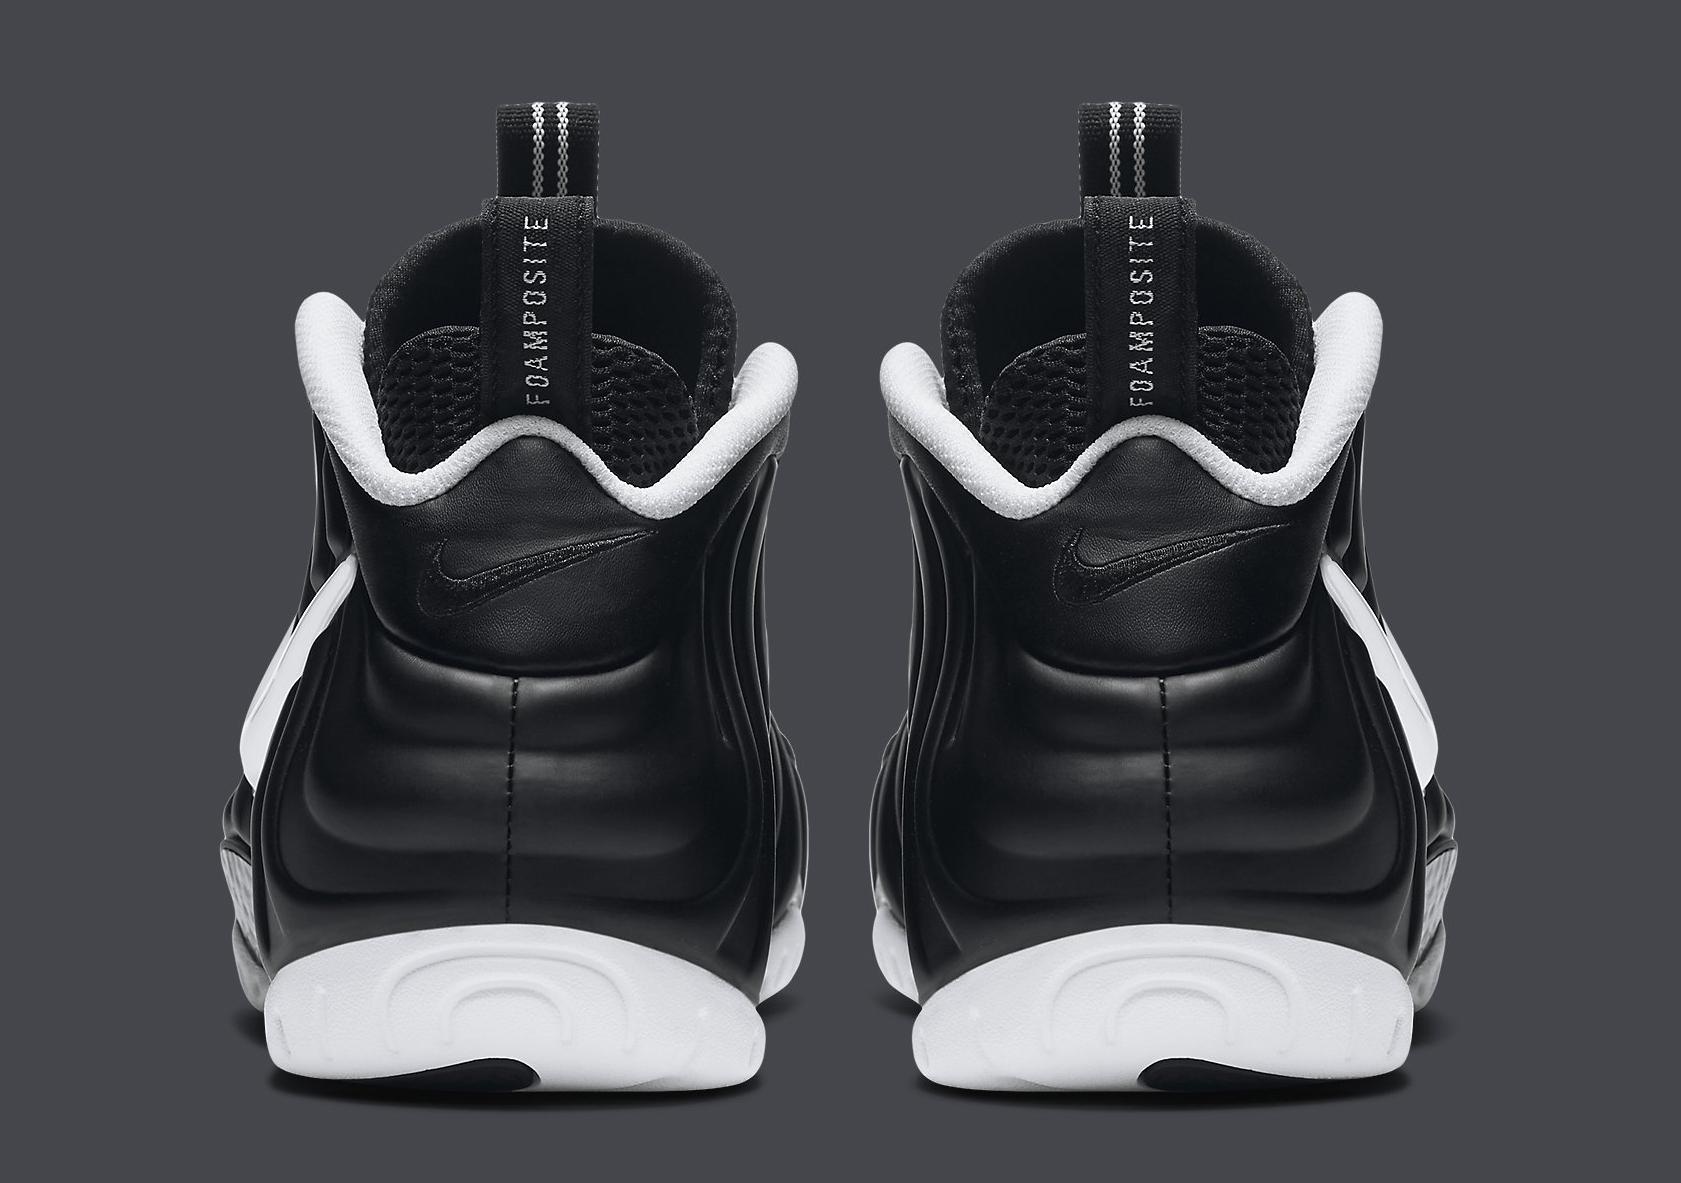 550f67563b1 Nike Foamposite Pro Dr Doom Black Friday 624041-006